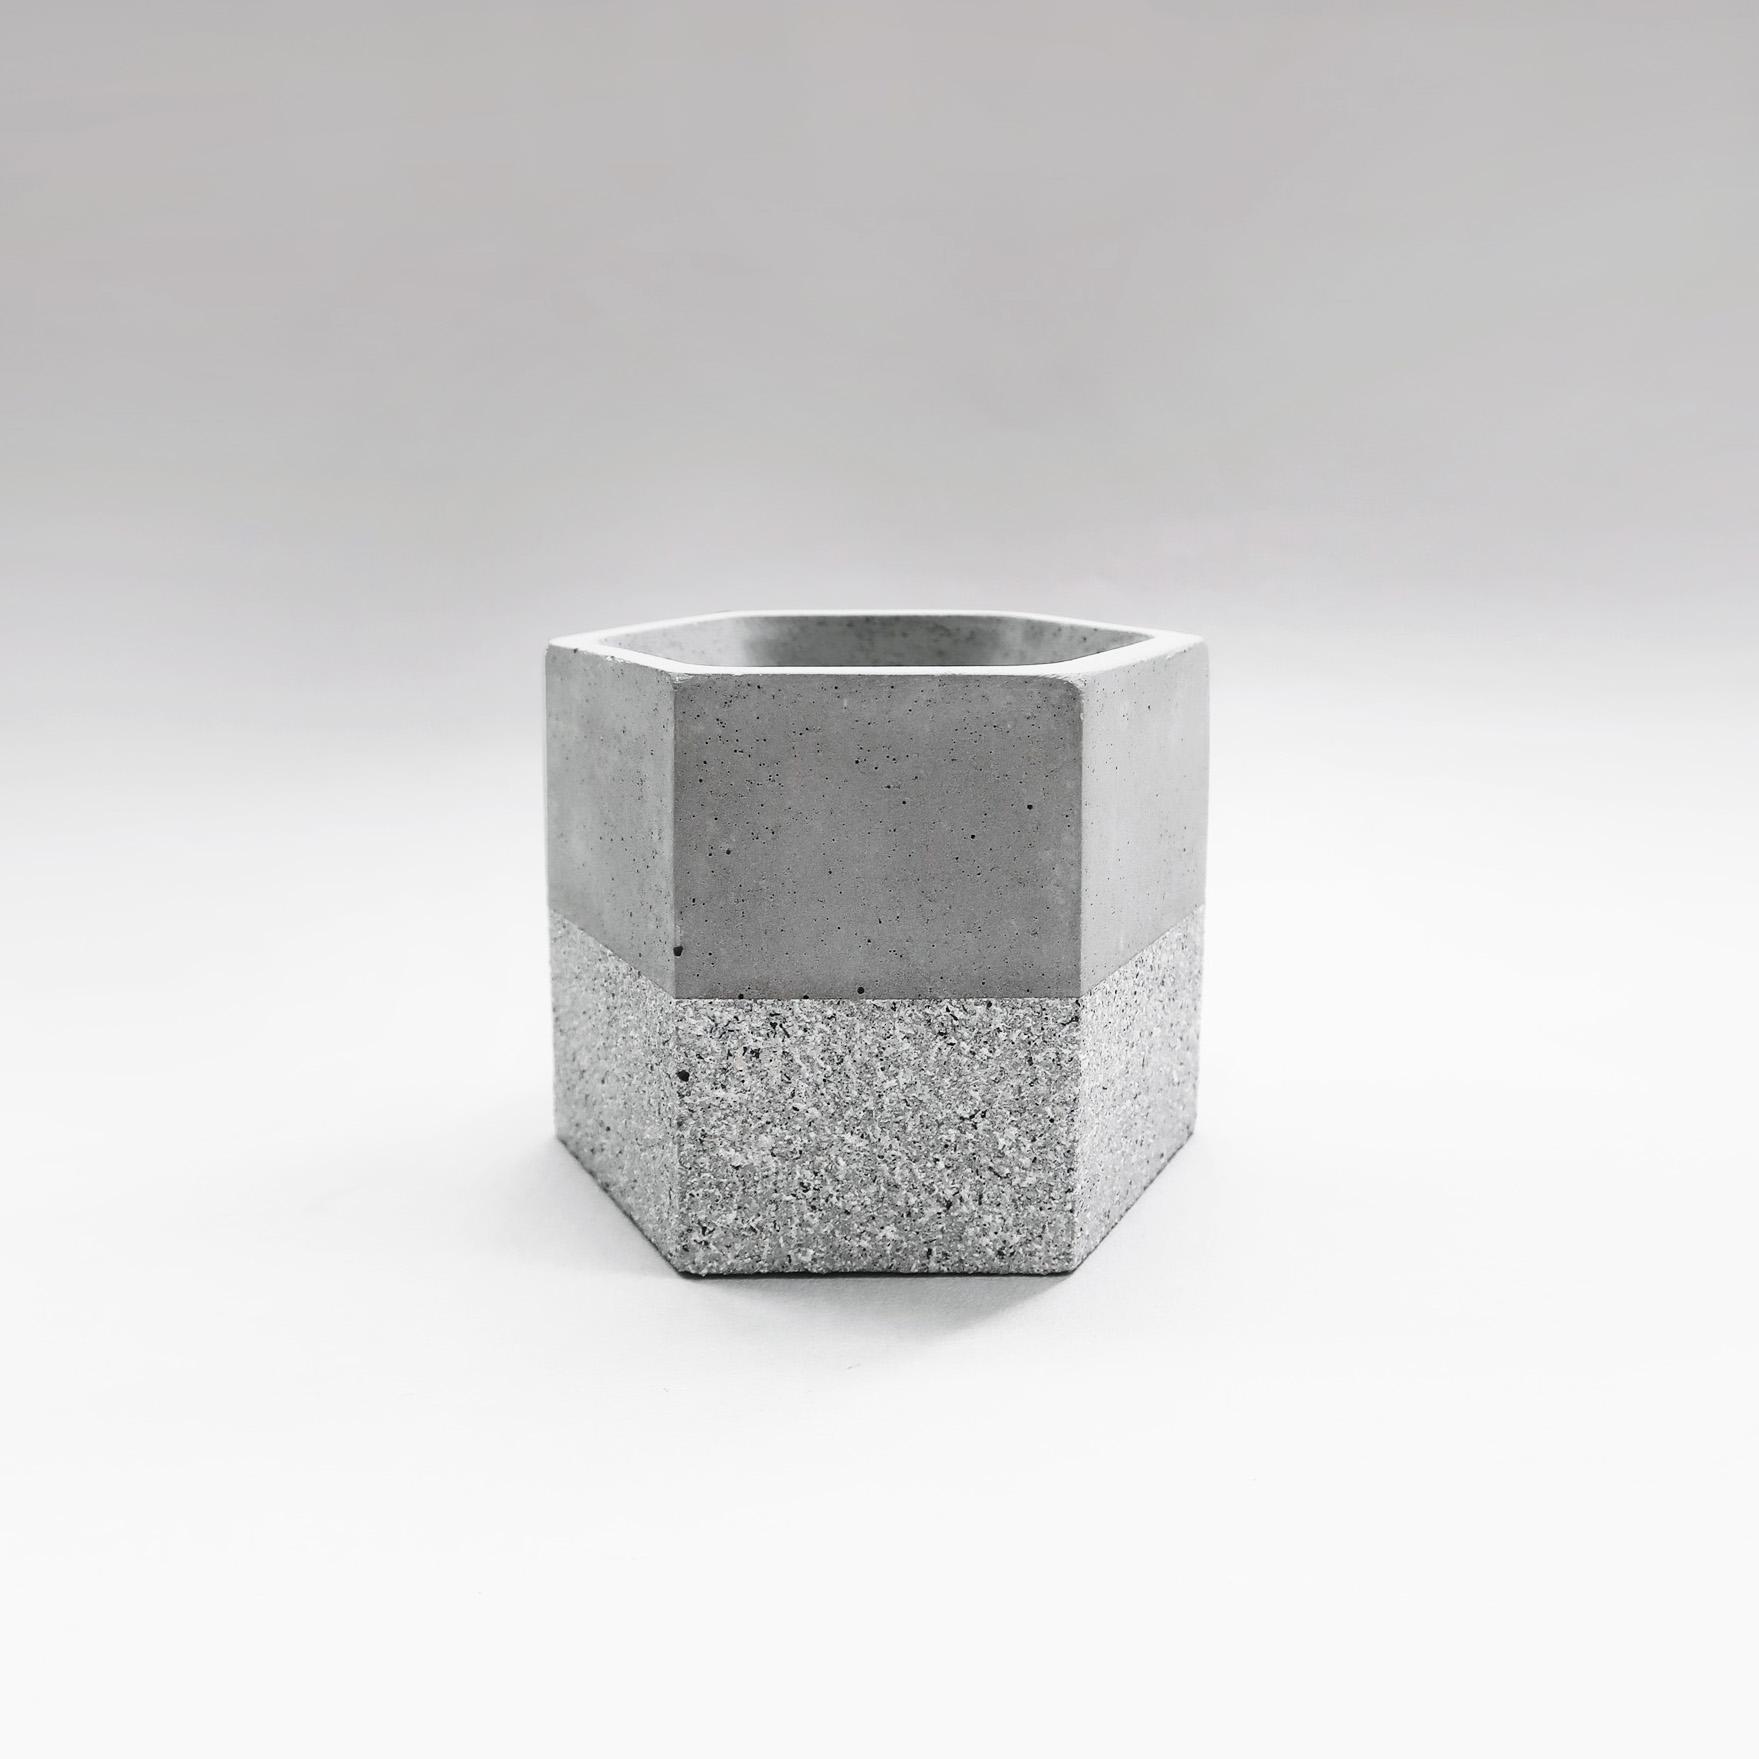 GRANITE 花崗岩雙色六角水泥盆器 / hexagonal concrete pot